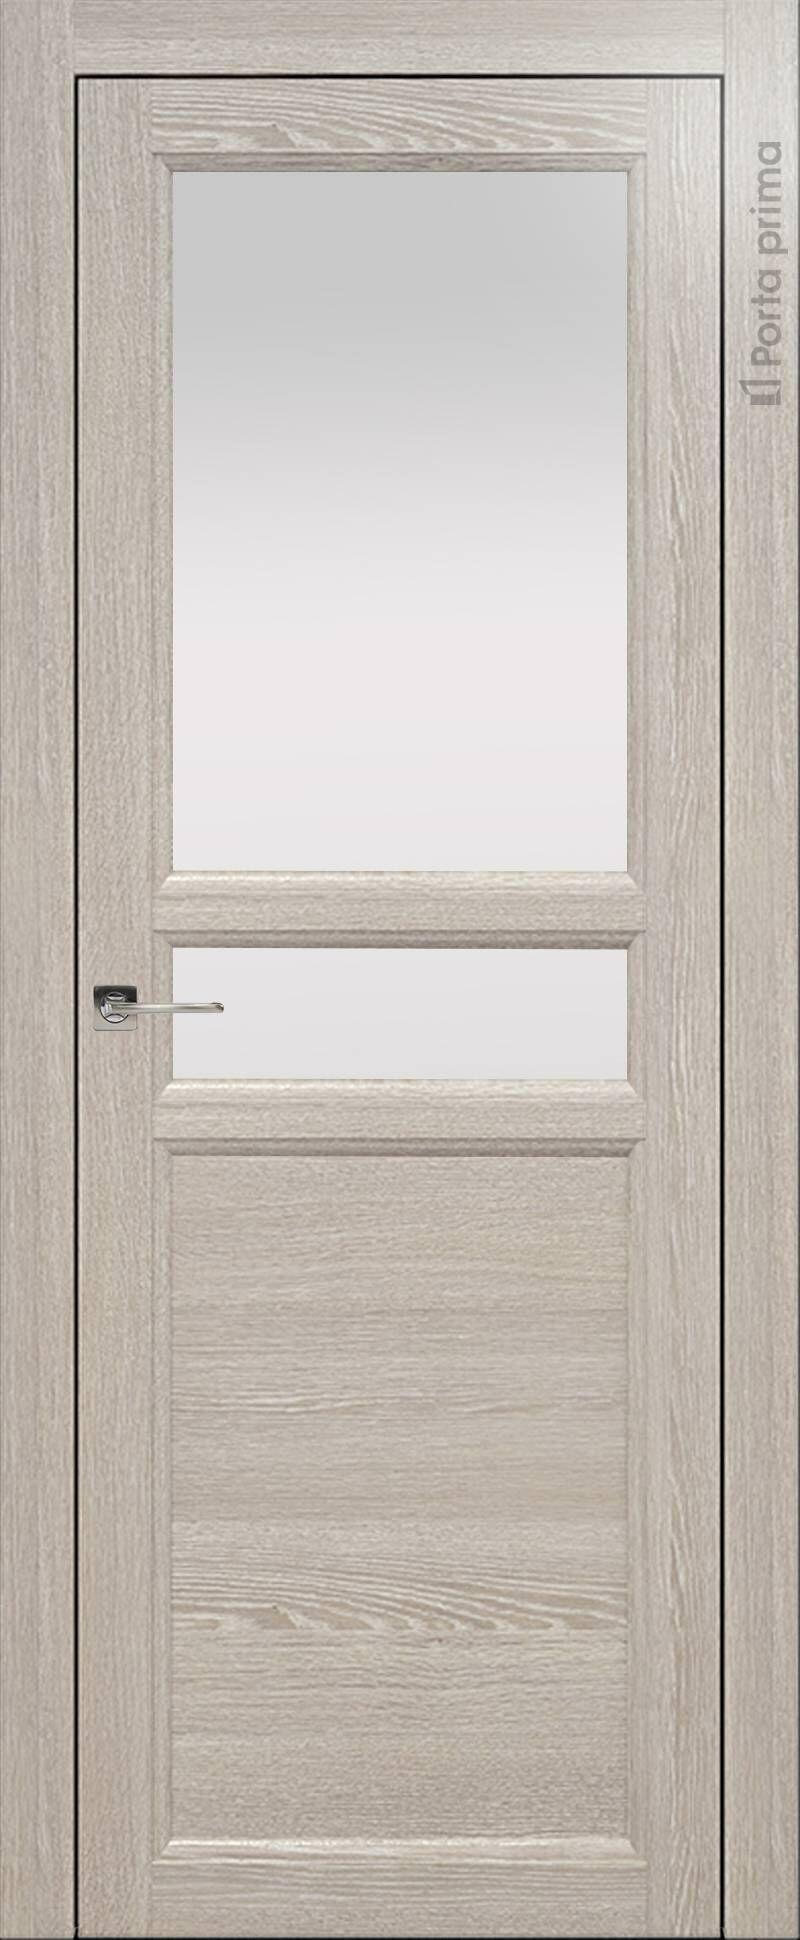 Sorrento-R Д2 цвет - Серый дуб Со стеклом (ДО)